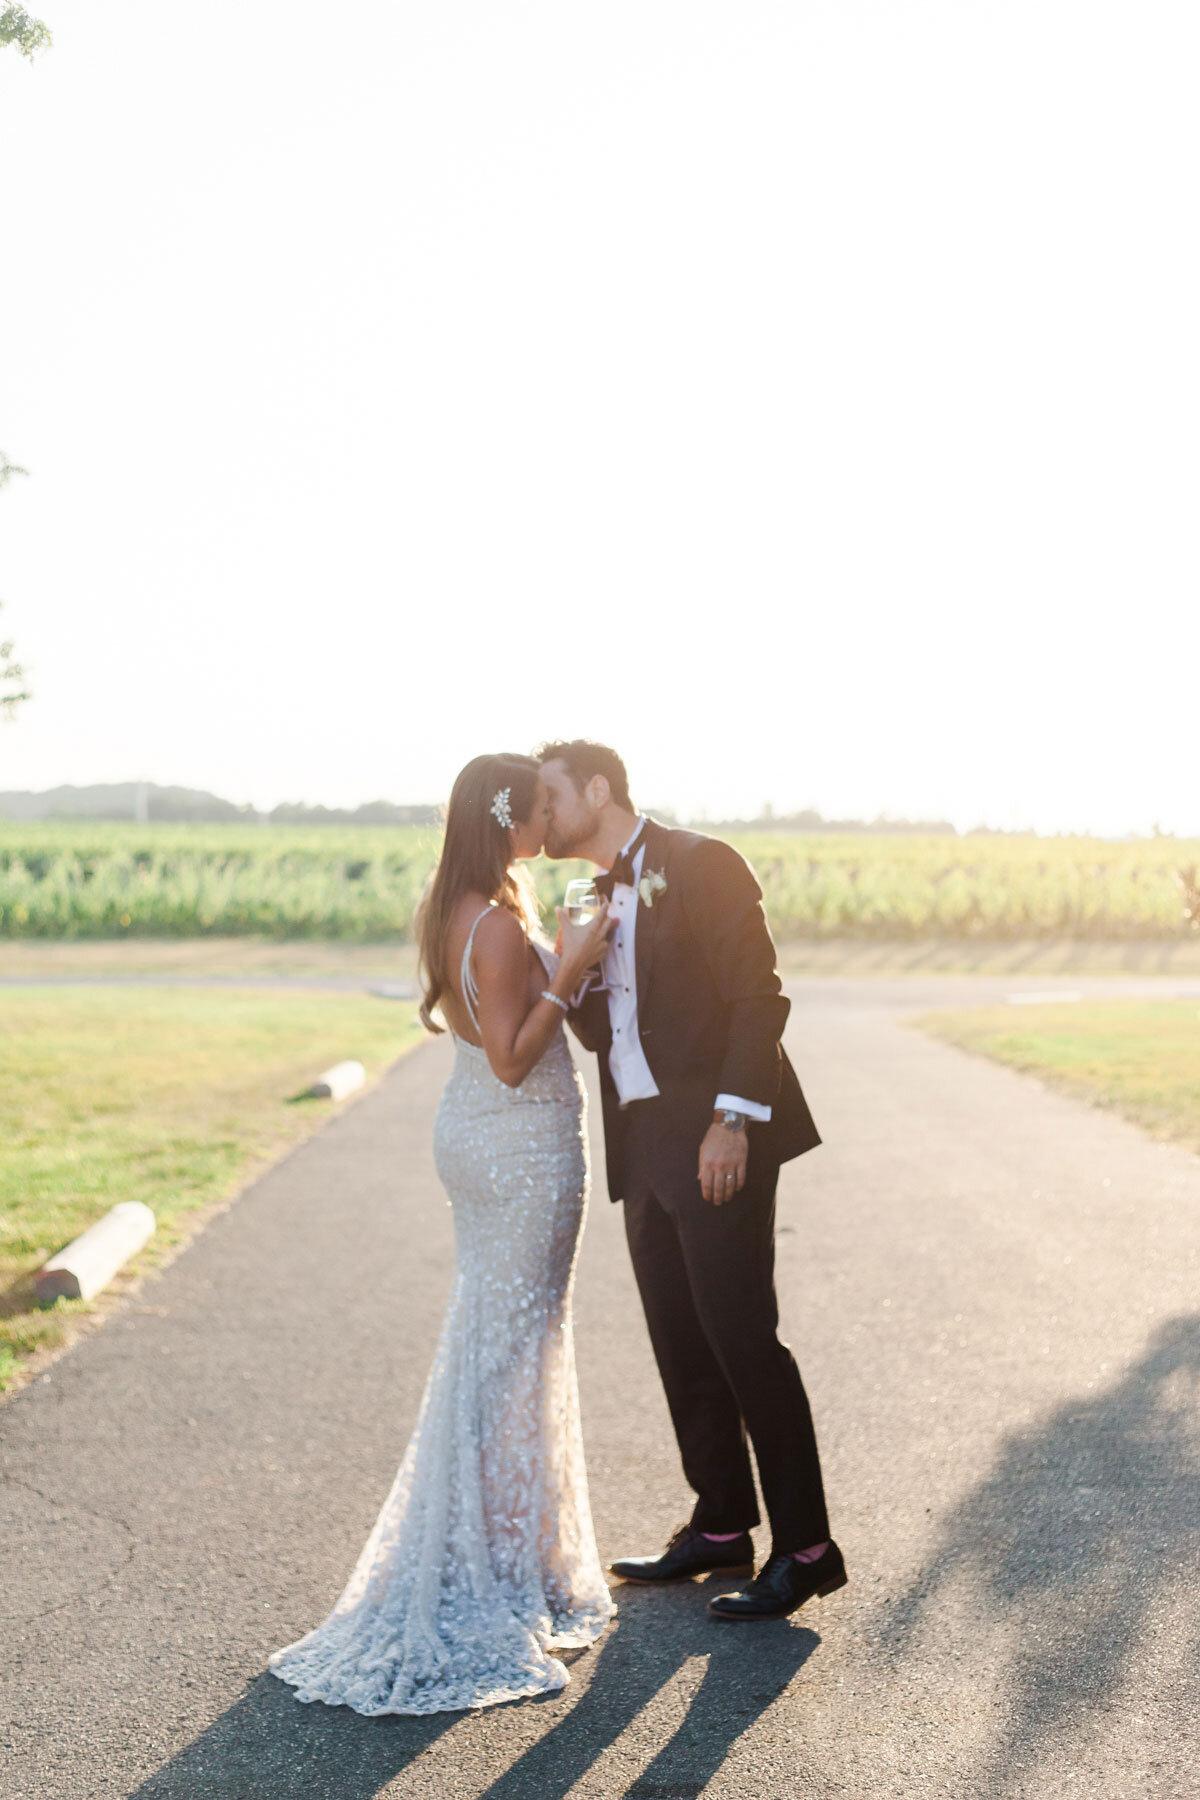 Chateau-des-Charmes-Wedding-Summer-Vineyard-Bride-Niagara-on-the-Lake-photos-by-Gemini-Photography-Ontario-0073.jpg